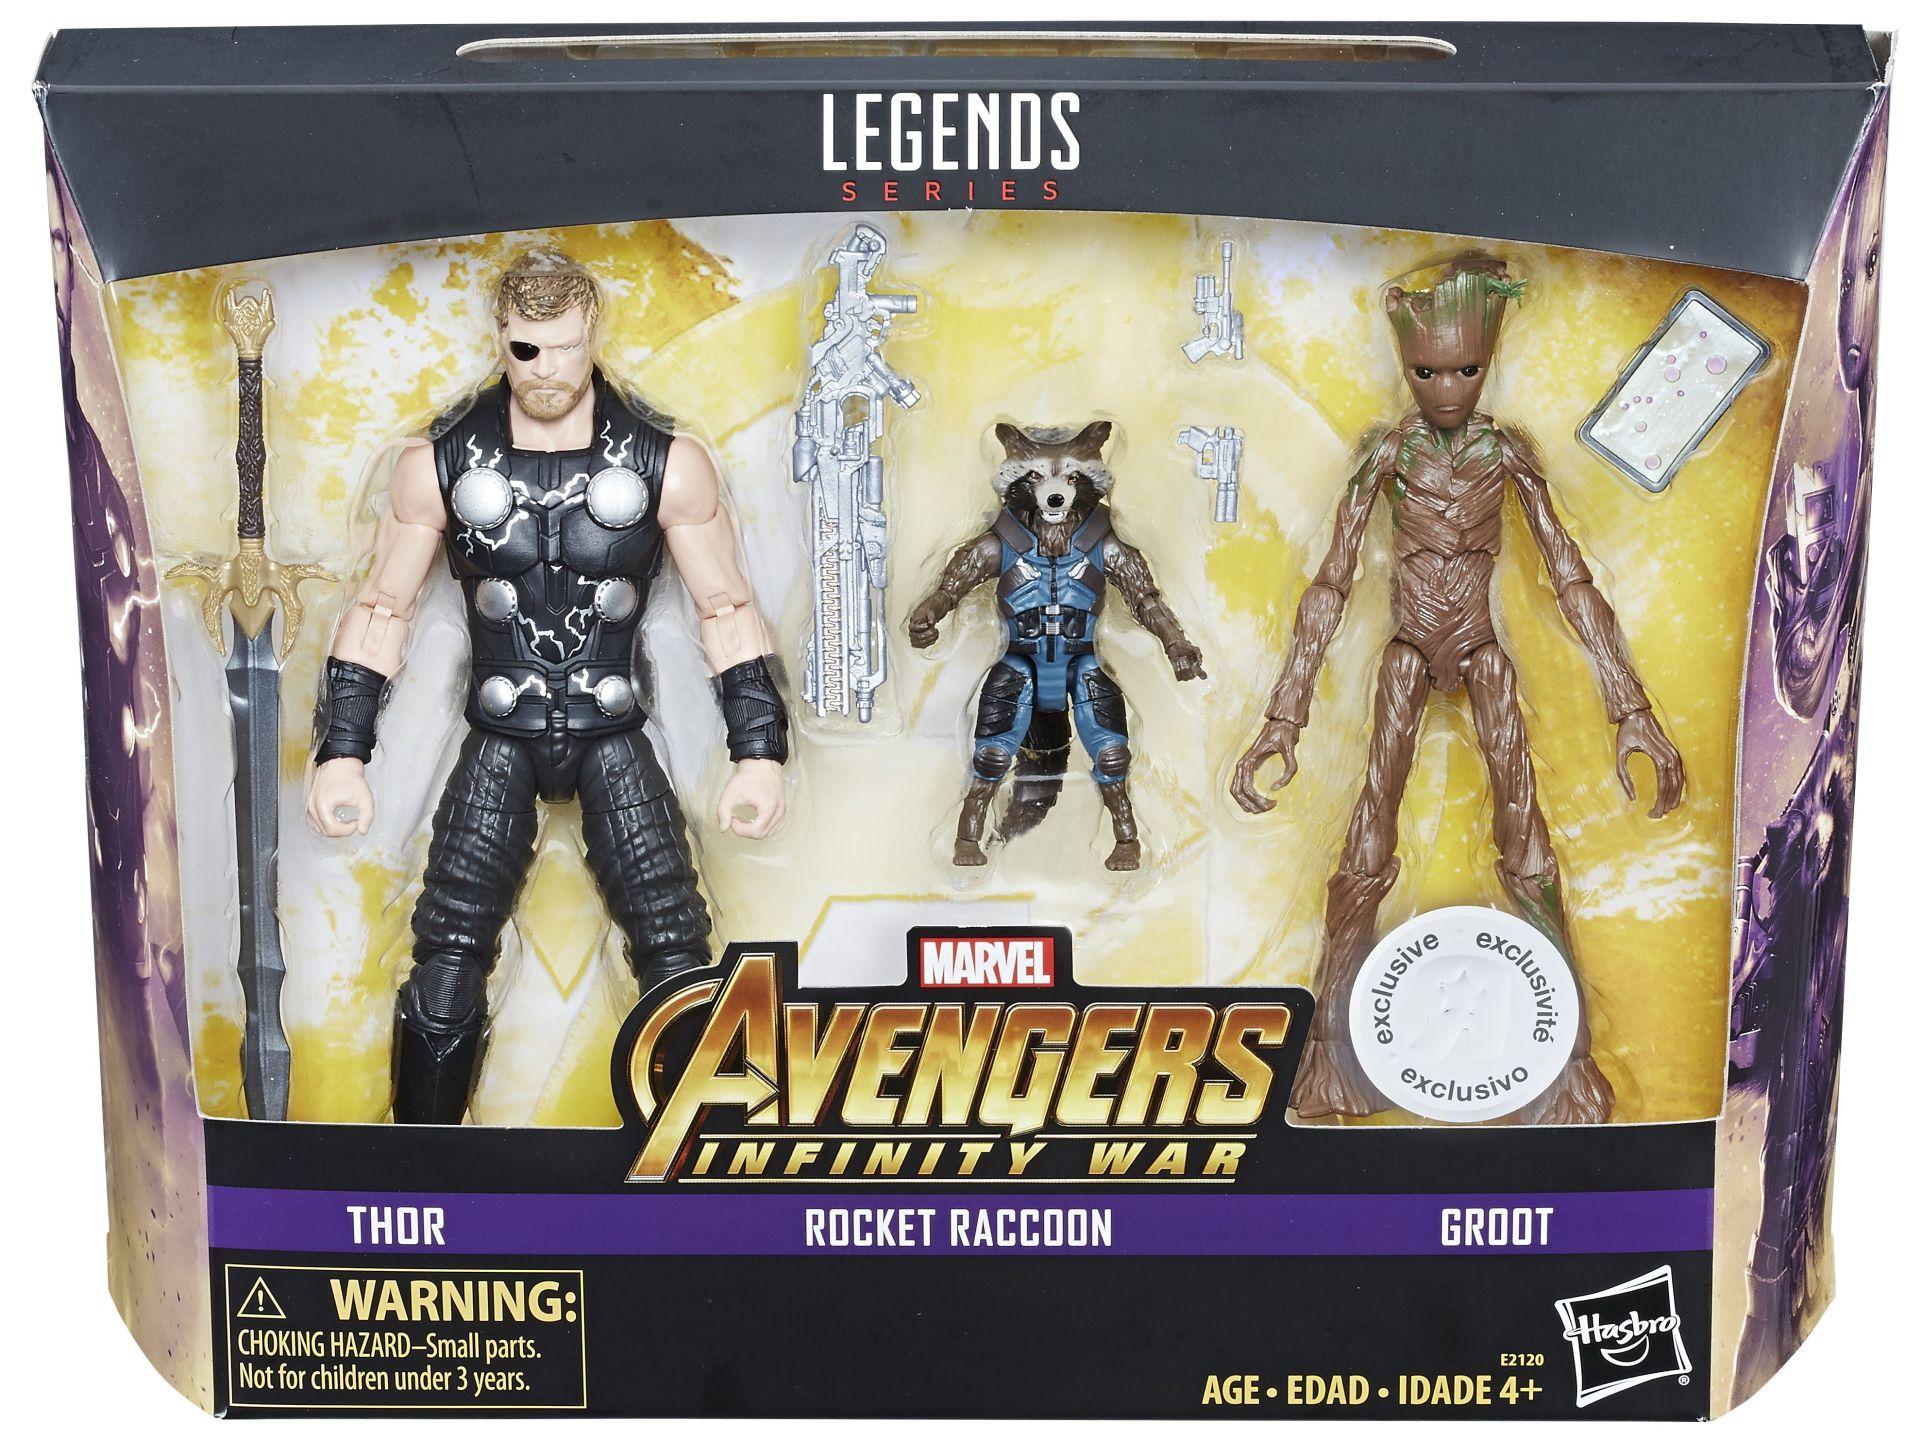 Hasbro Reveals Retailer Exclusive Marvel Legends Multi